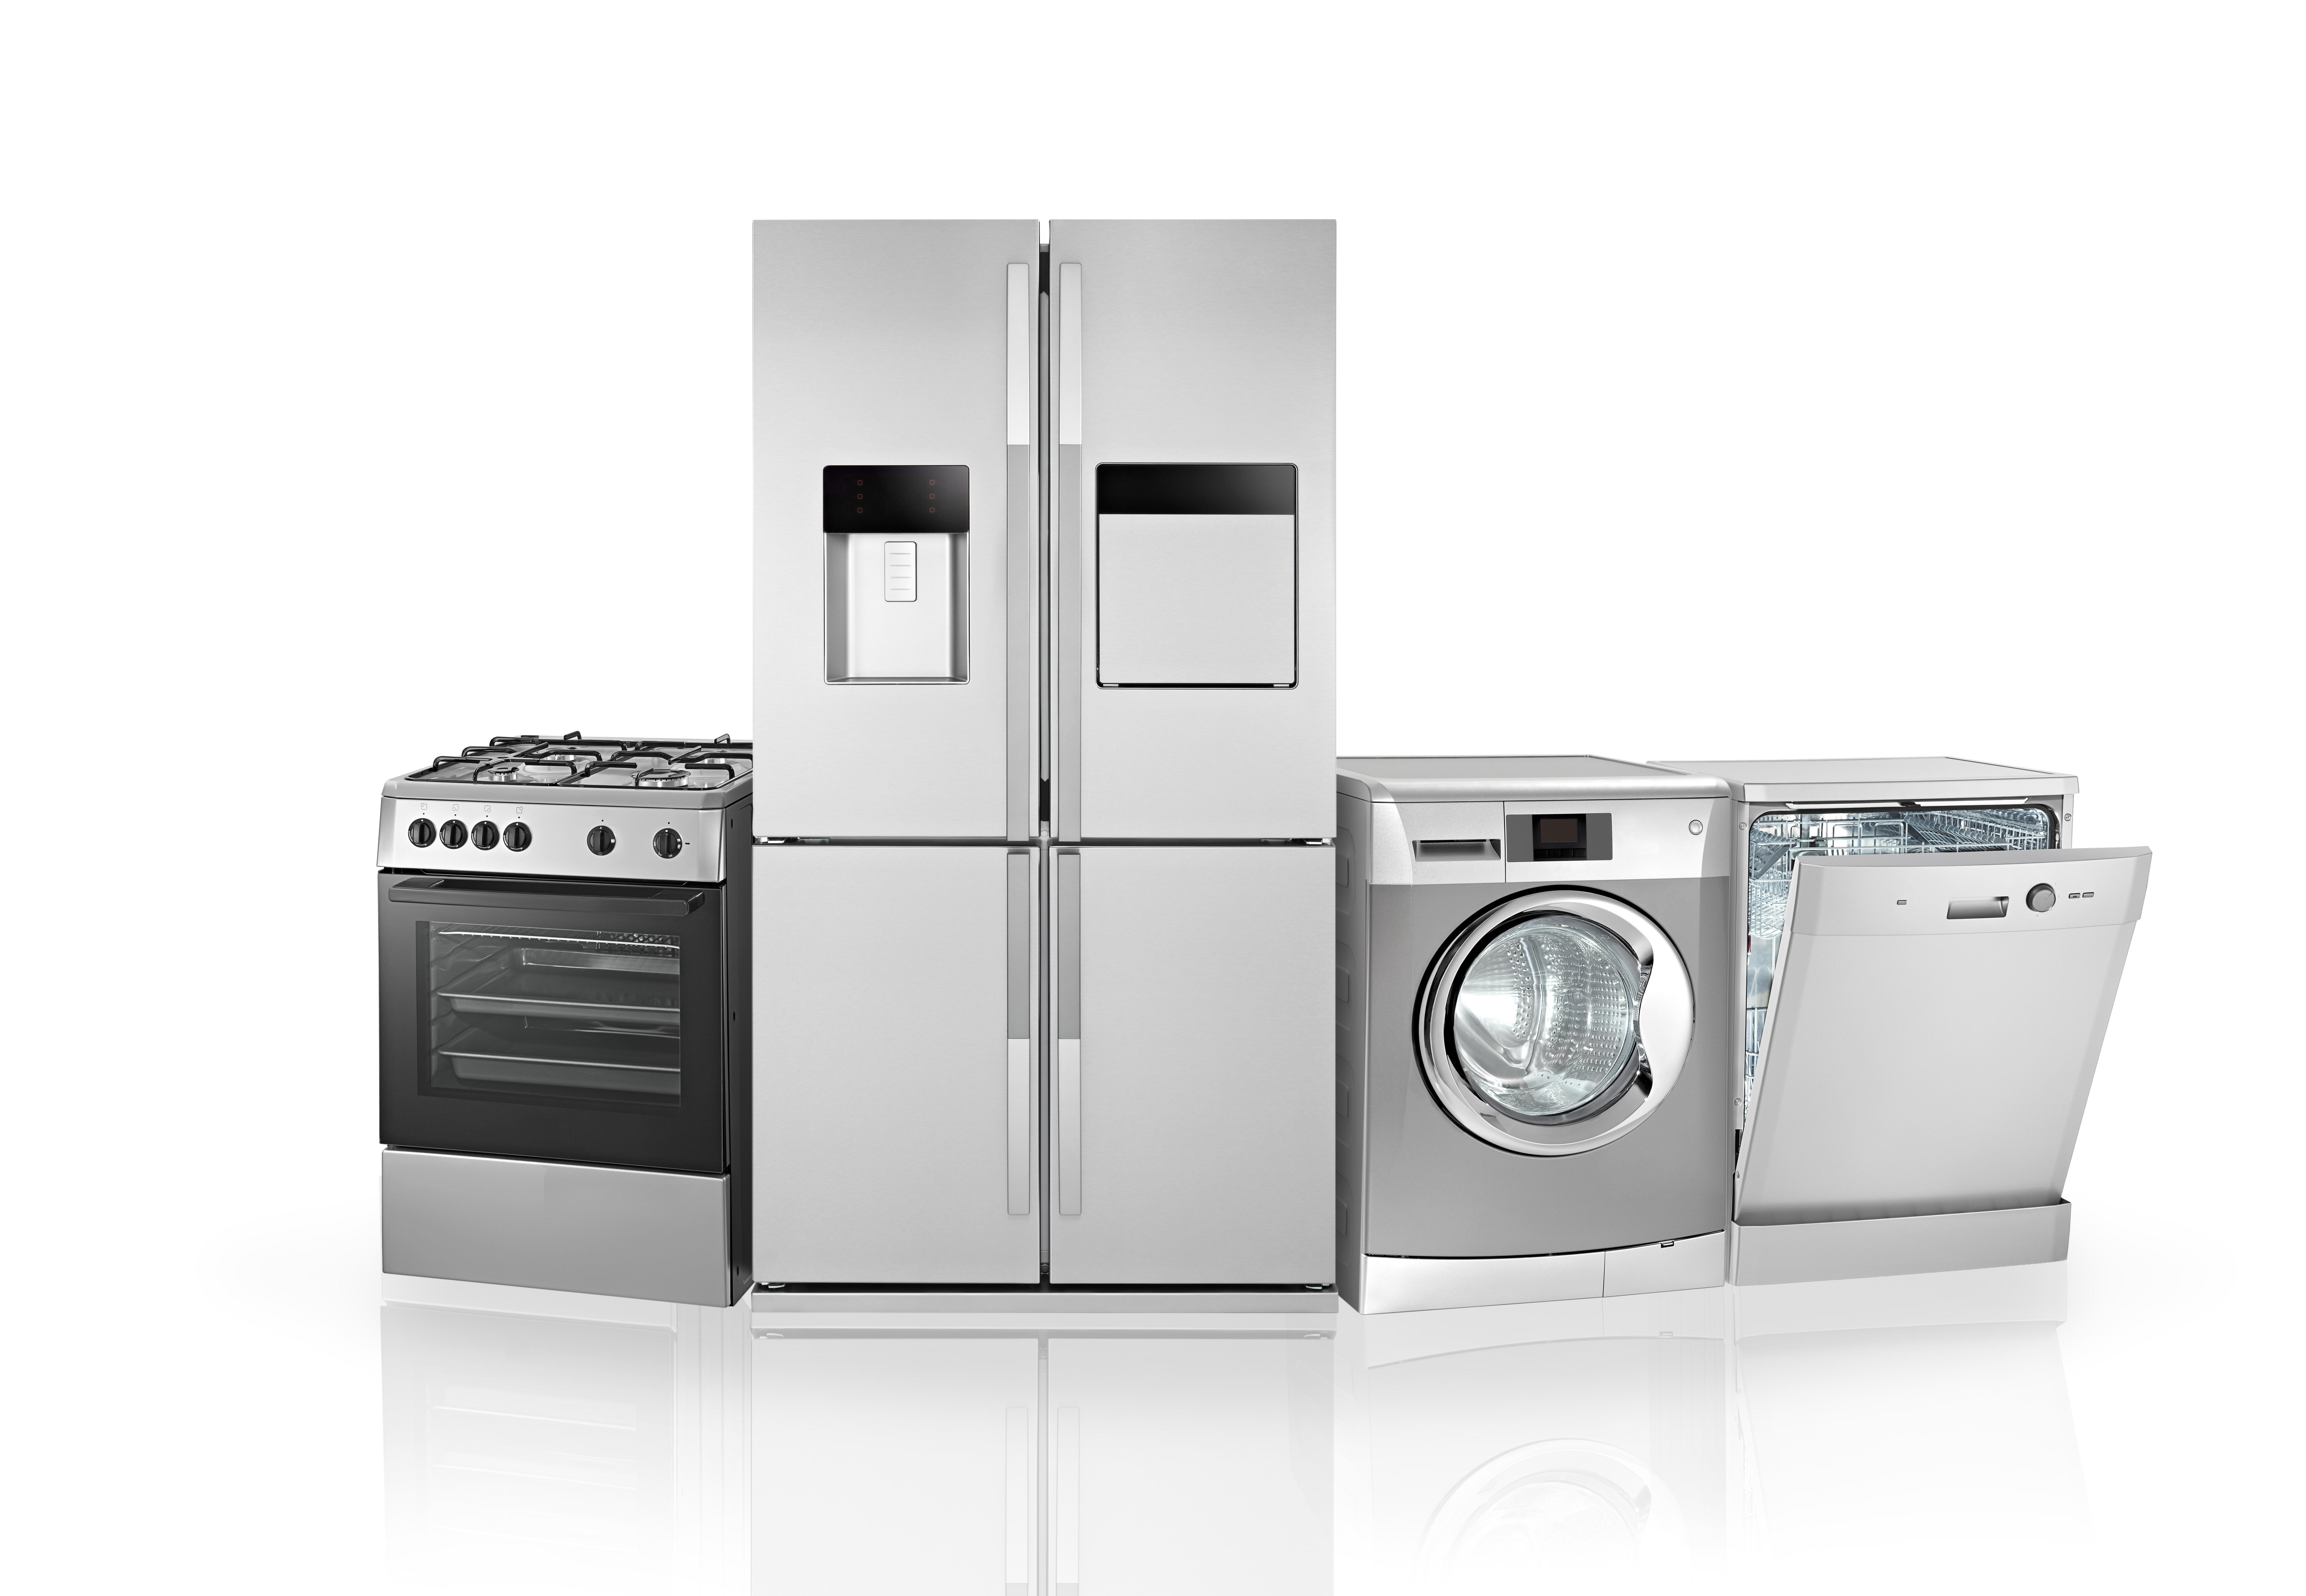 TecsaReco Appliance Divison